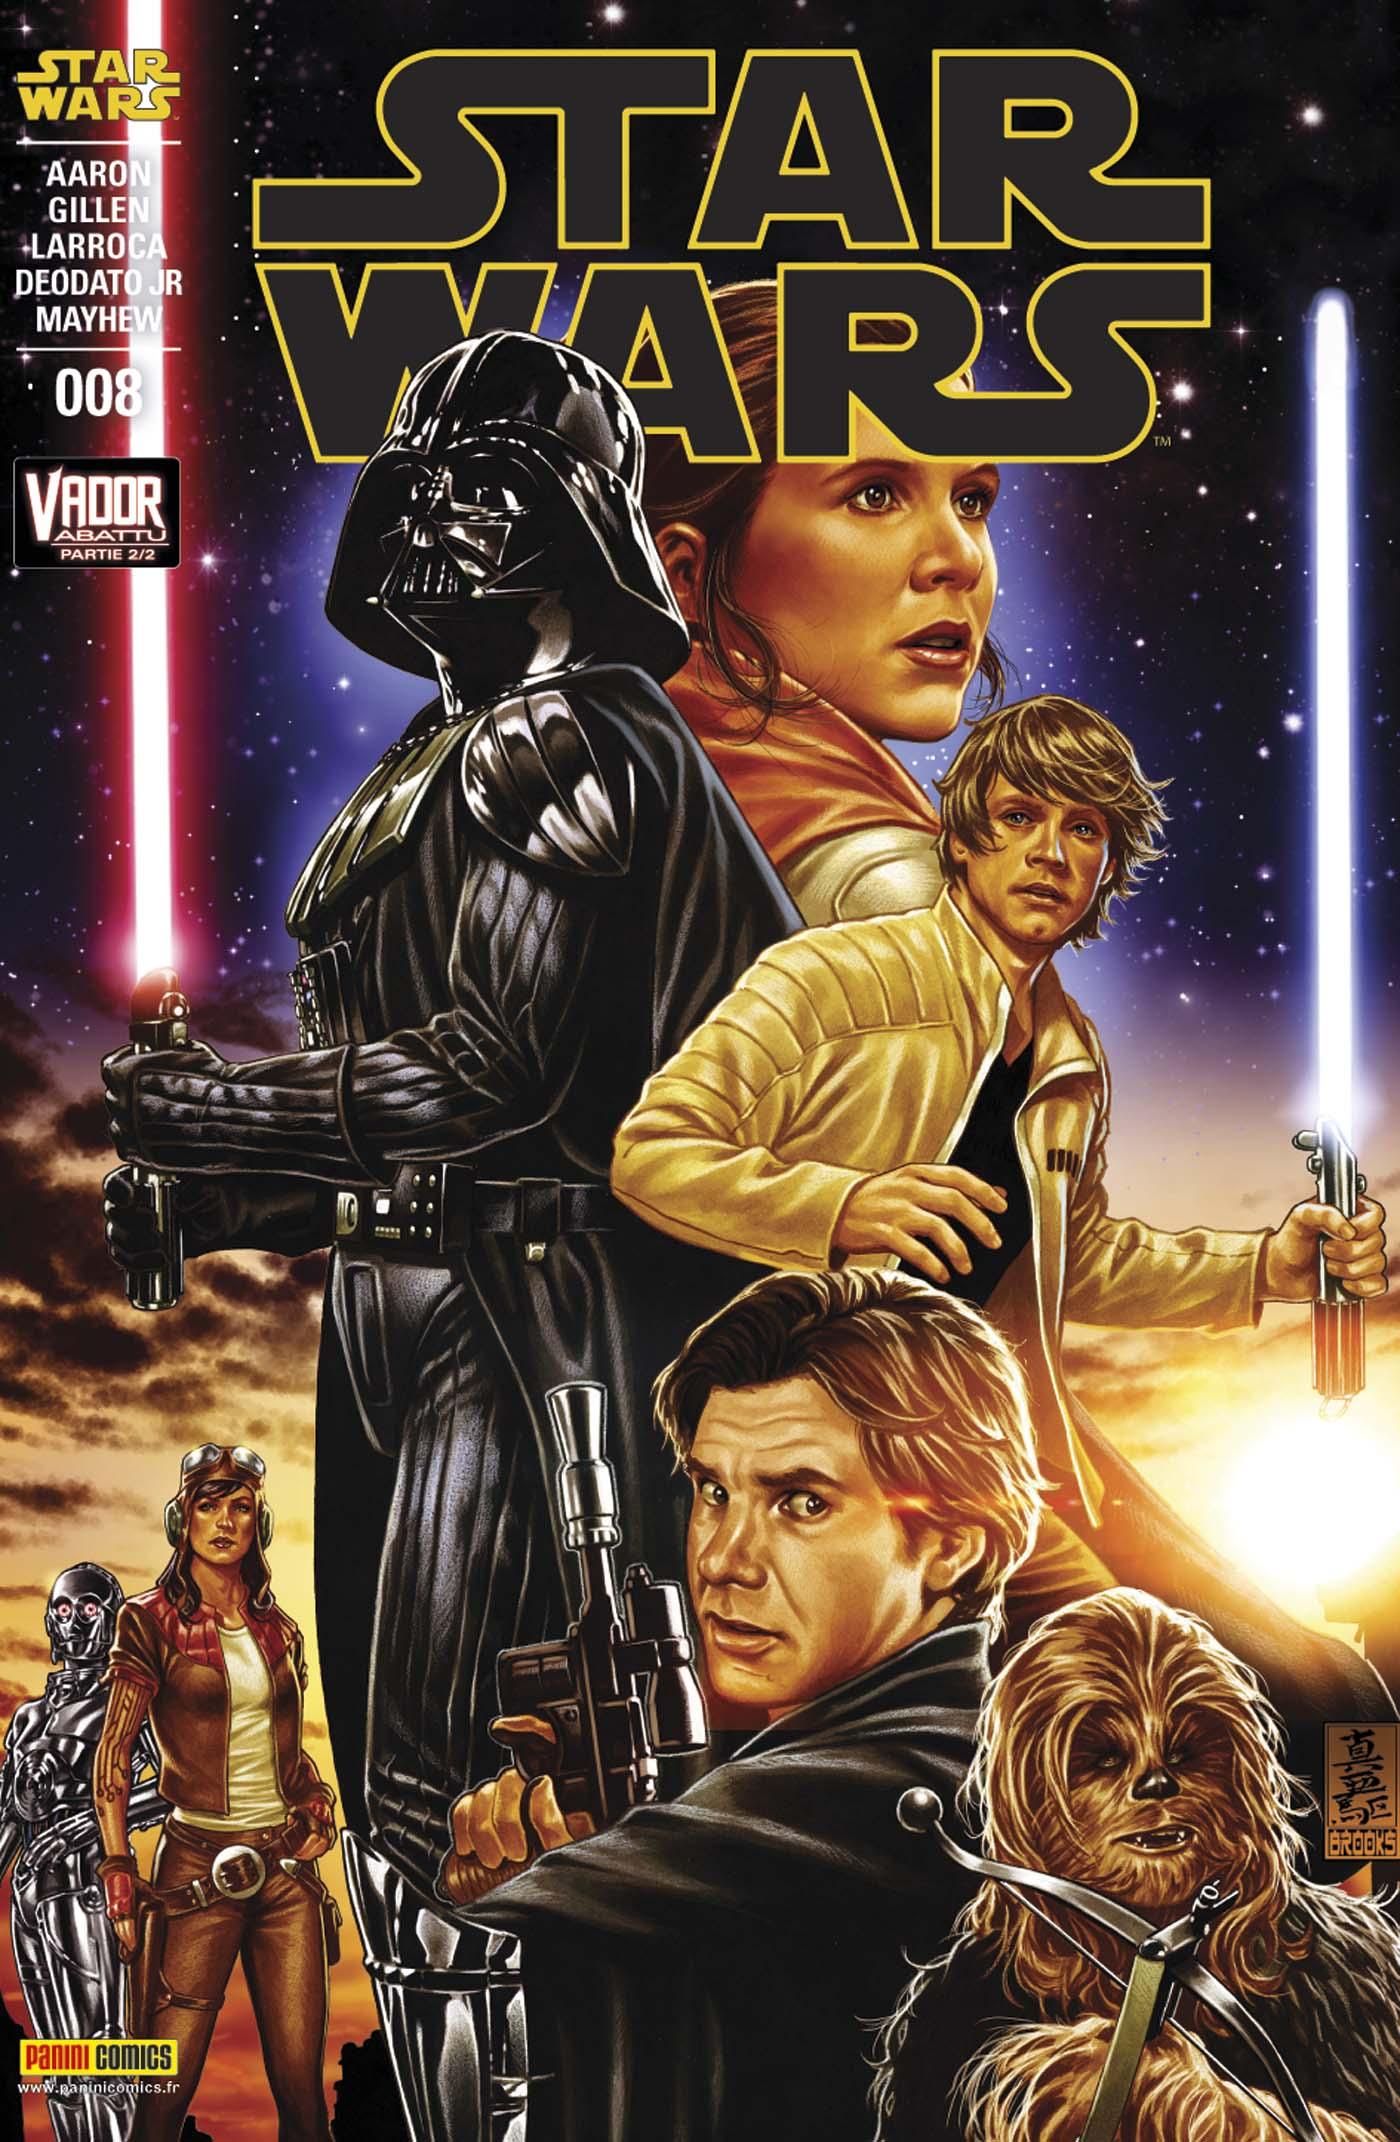 Star Wars Comics 8 - Couverture A